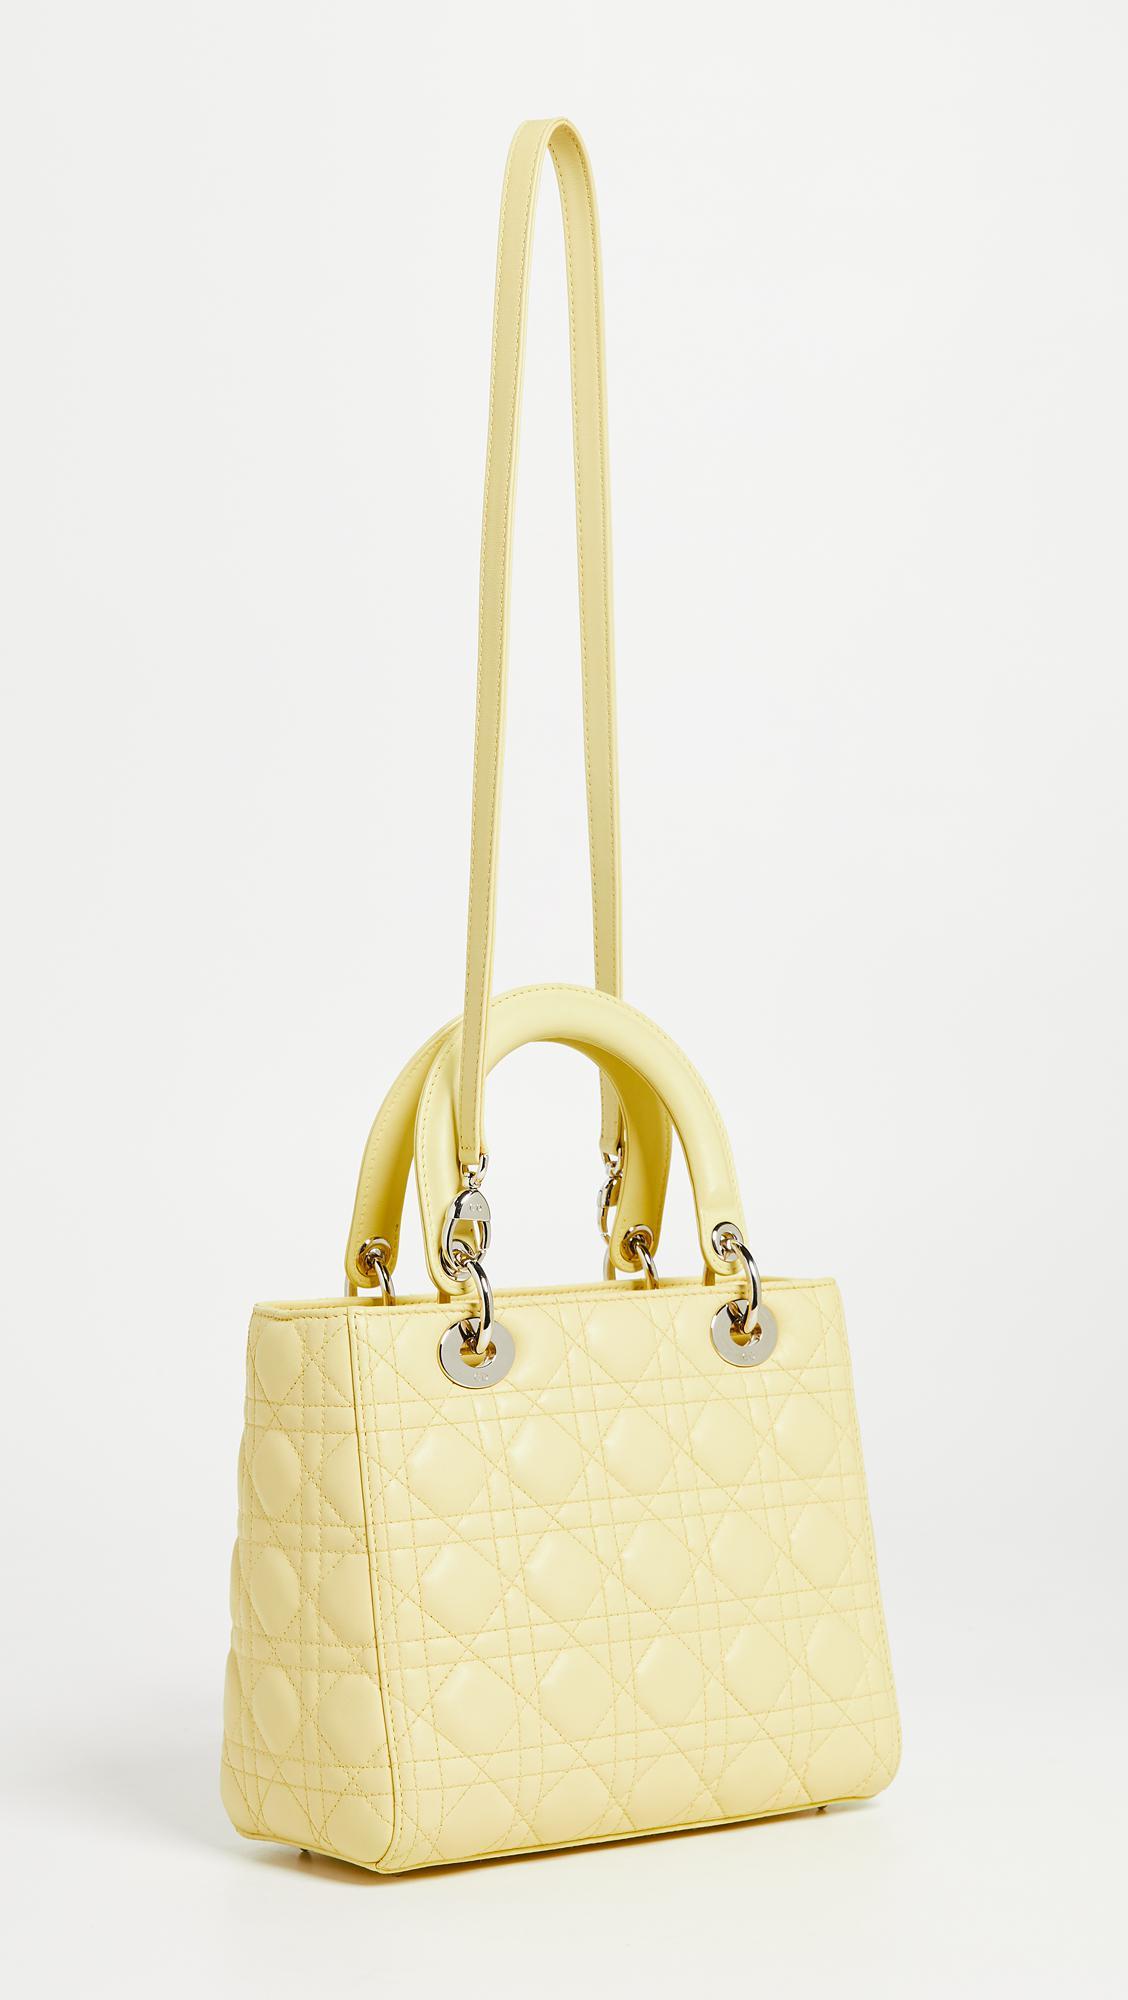 2c22f537b9d4 Lyst - What Goes Around Comes Around Dior Lambskin Medium Lady Dior ...